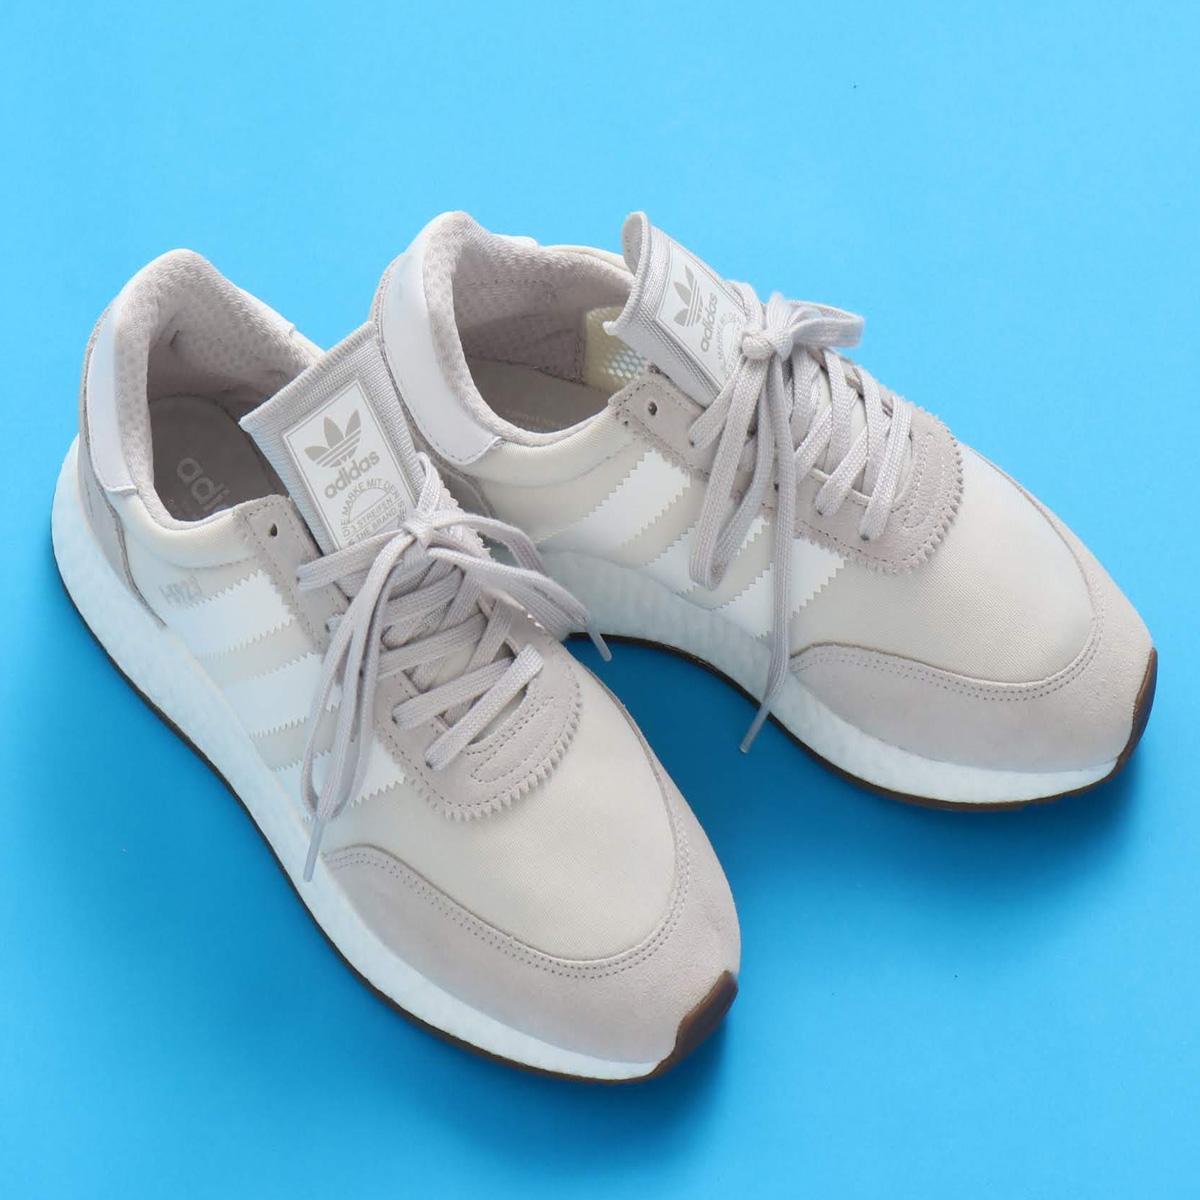 adidas Originals I-5923(アディダス オリジナルス I-5923)GREY/RUNNING WHITE/GREY【メンズ レディース スニーカー】18FW-I